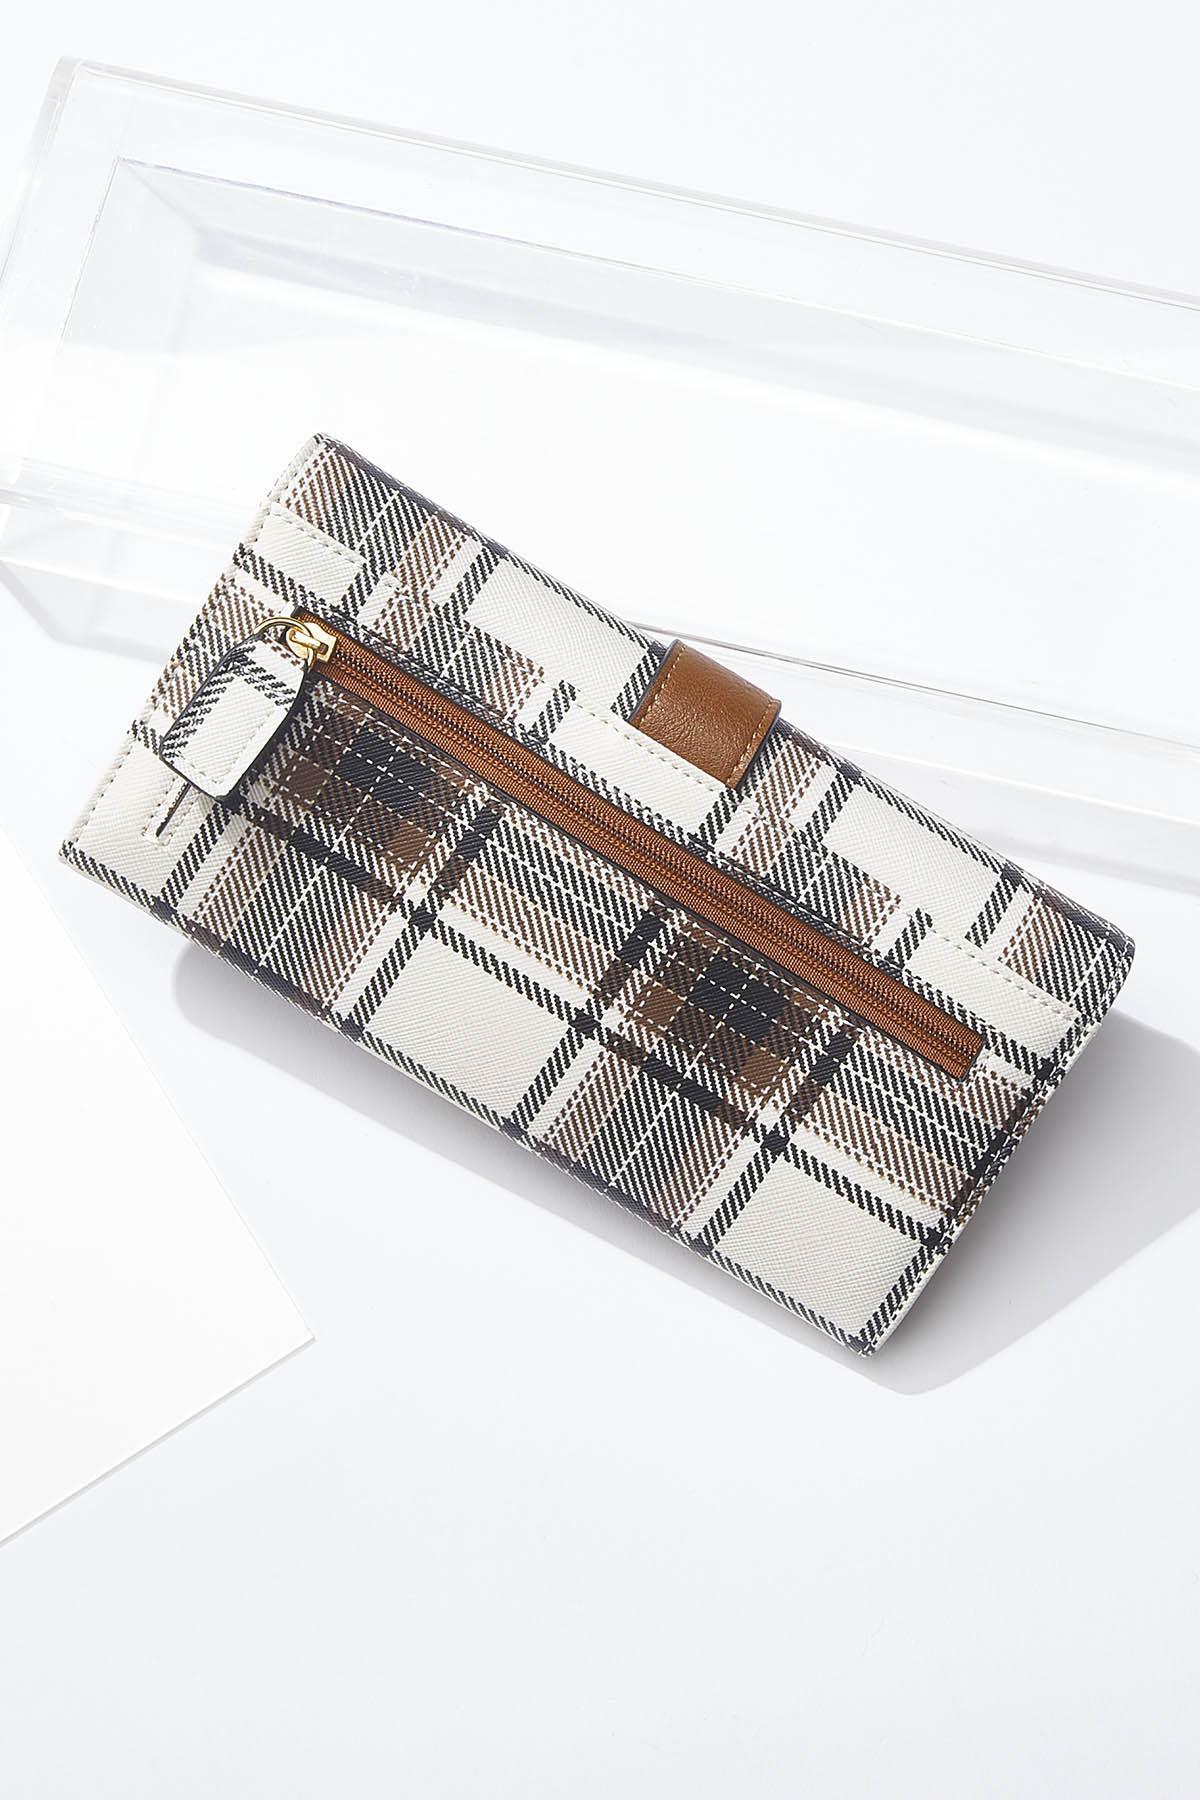 Buckle Strap Plaid Wallet (Item #44722975)